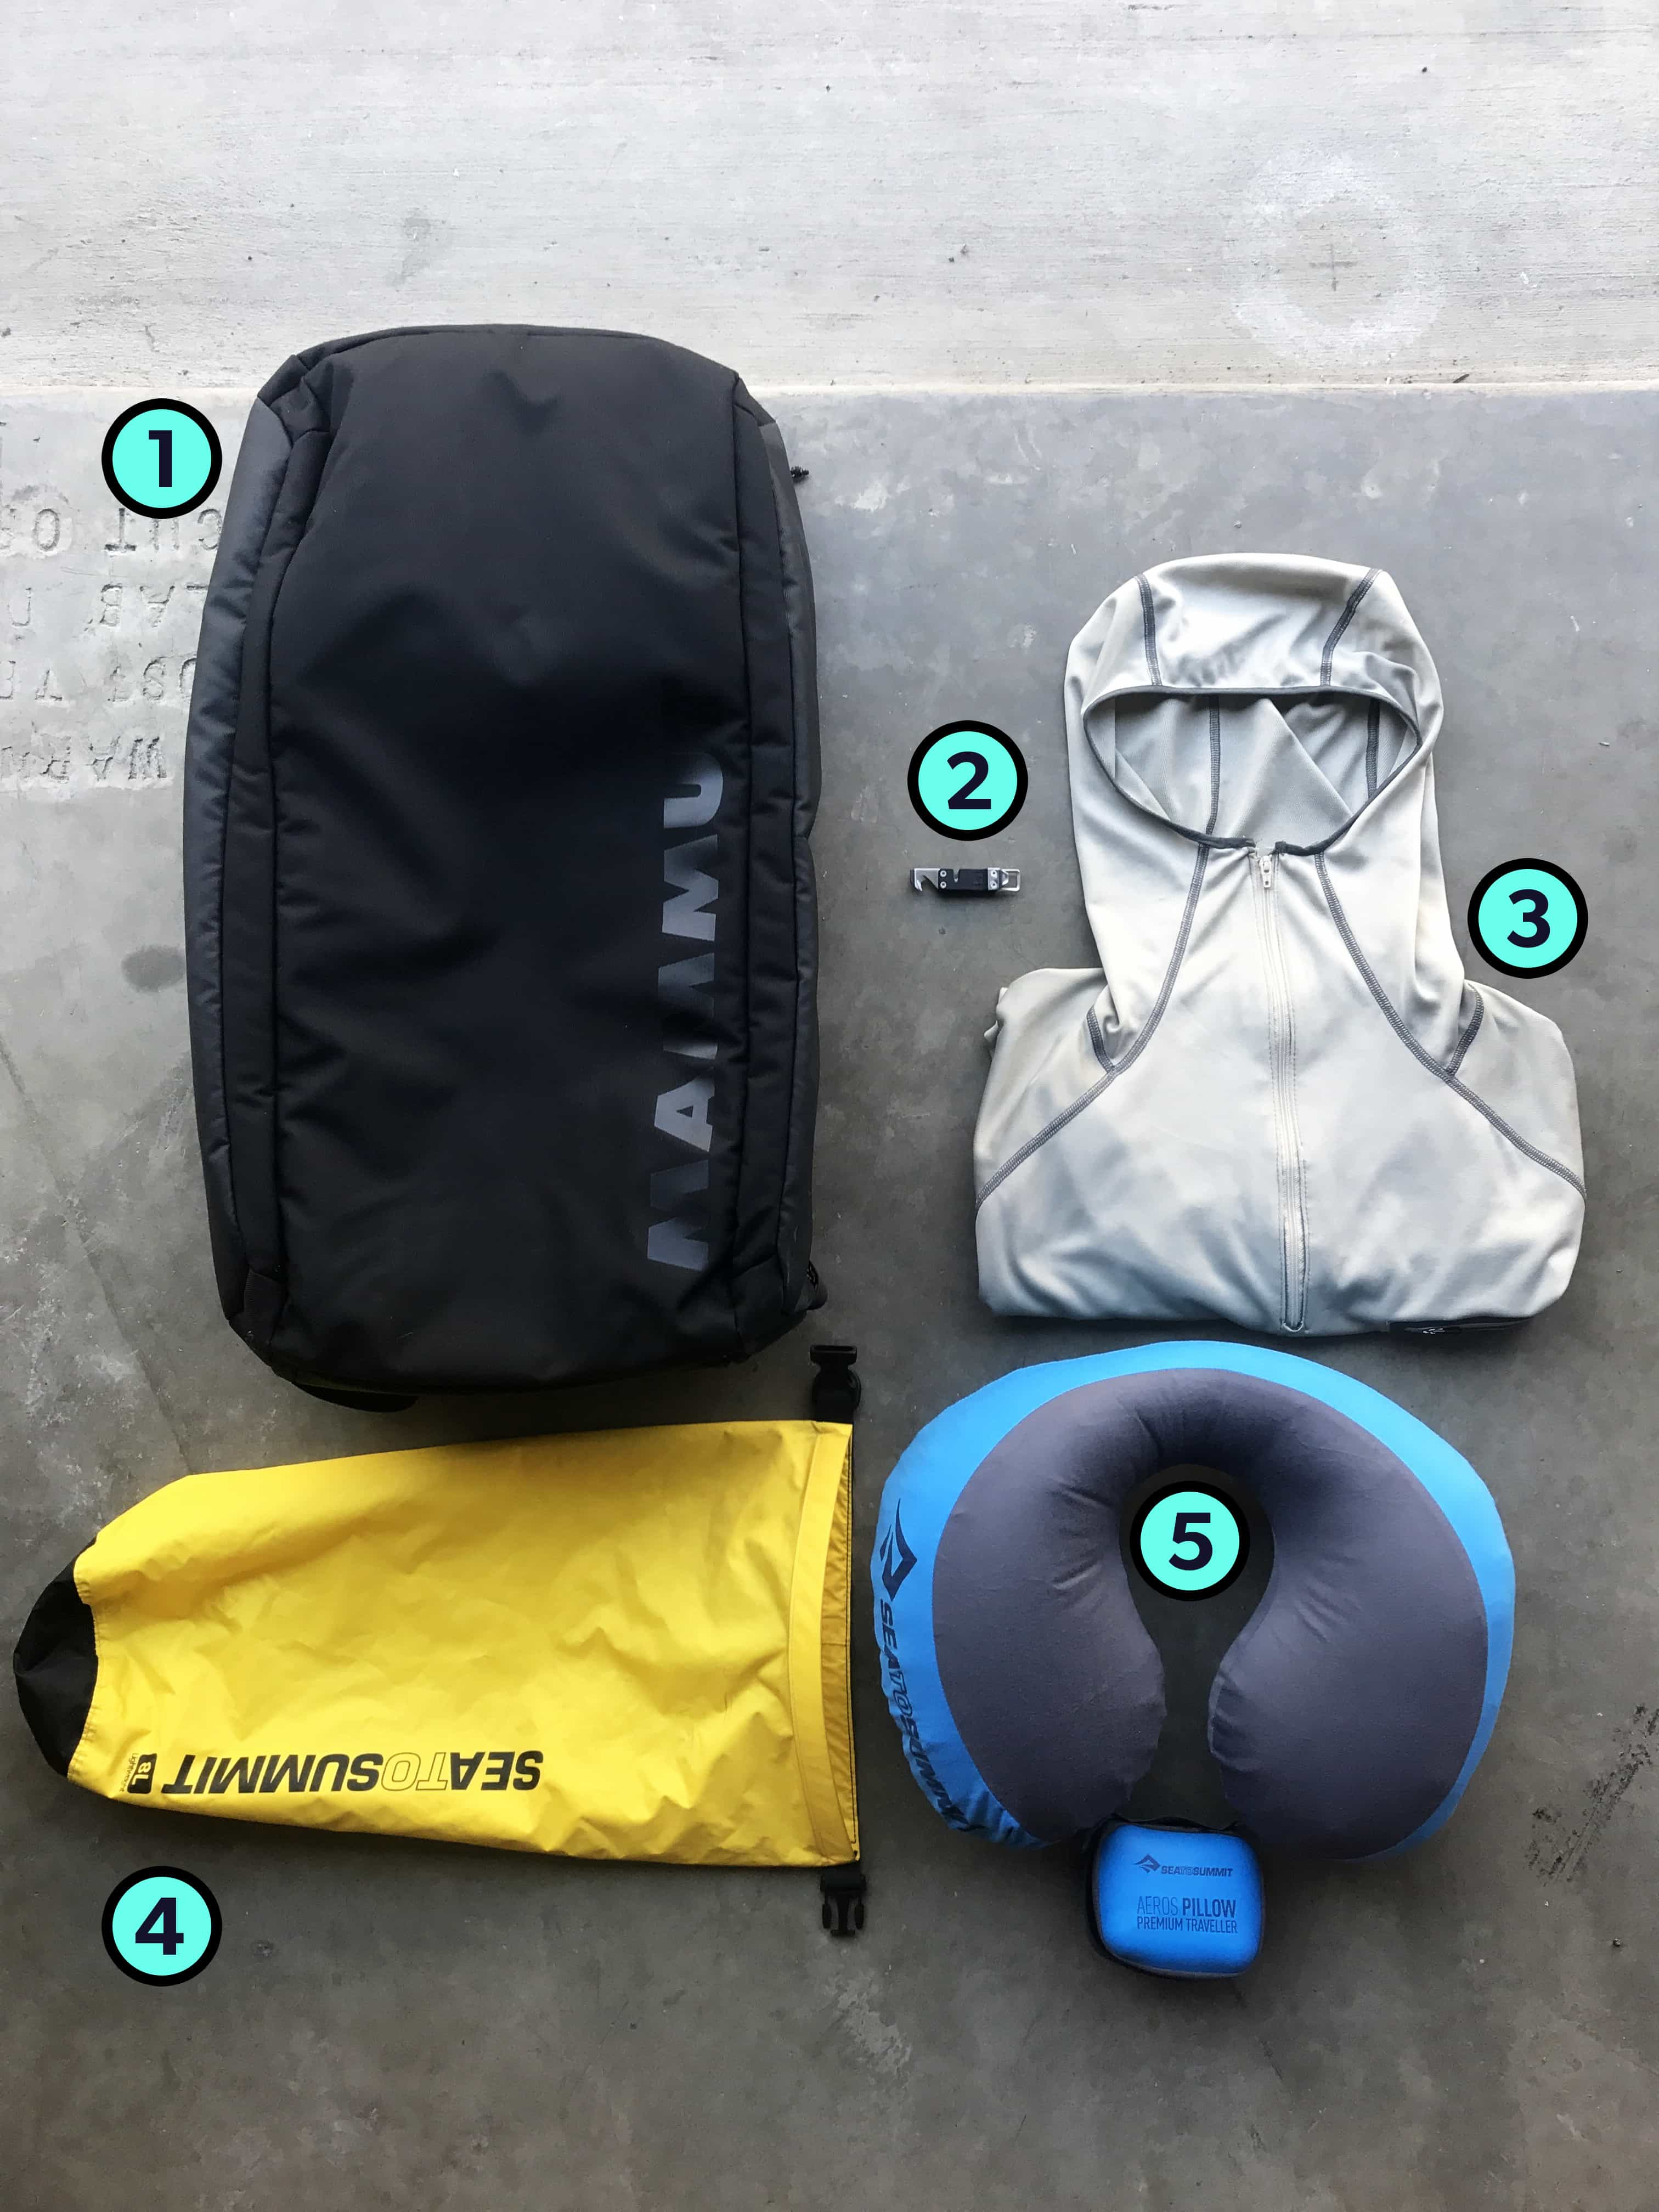 Phil Oliver's Trusty Three Travel Gear Items